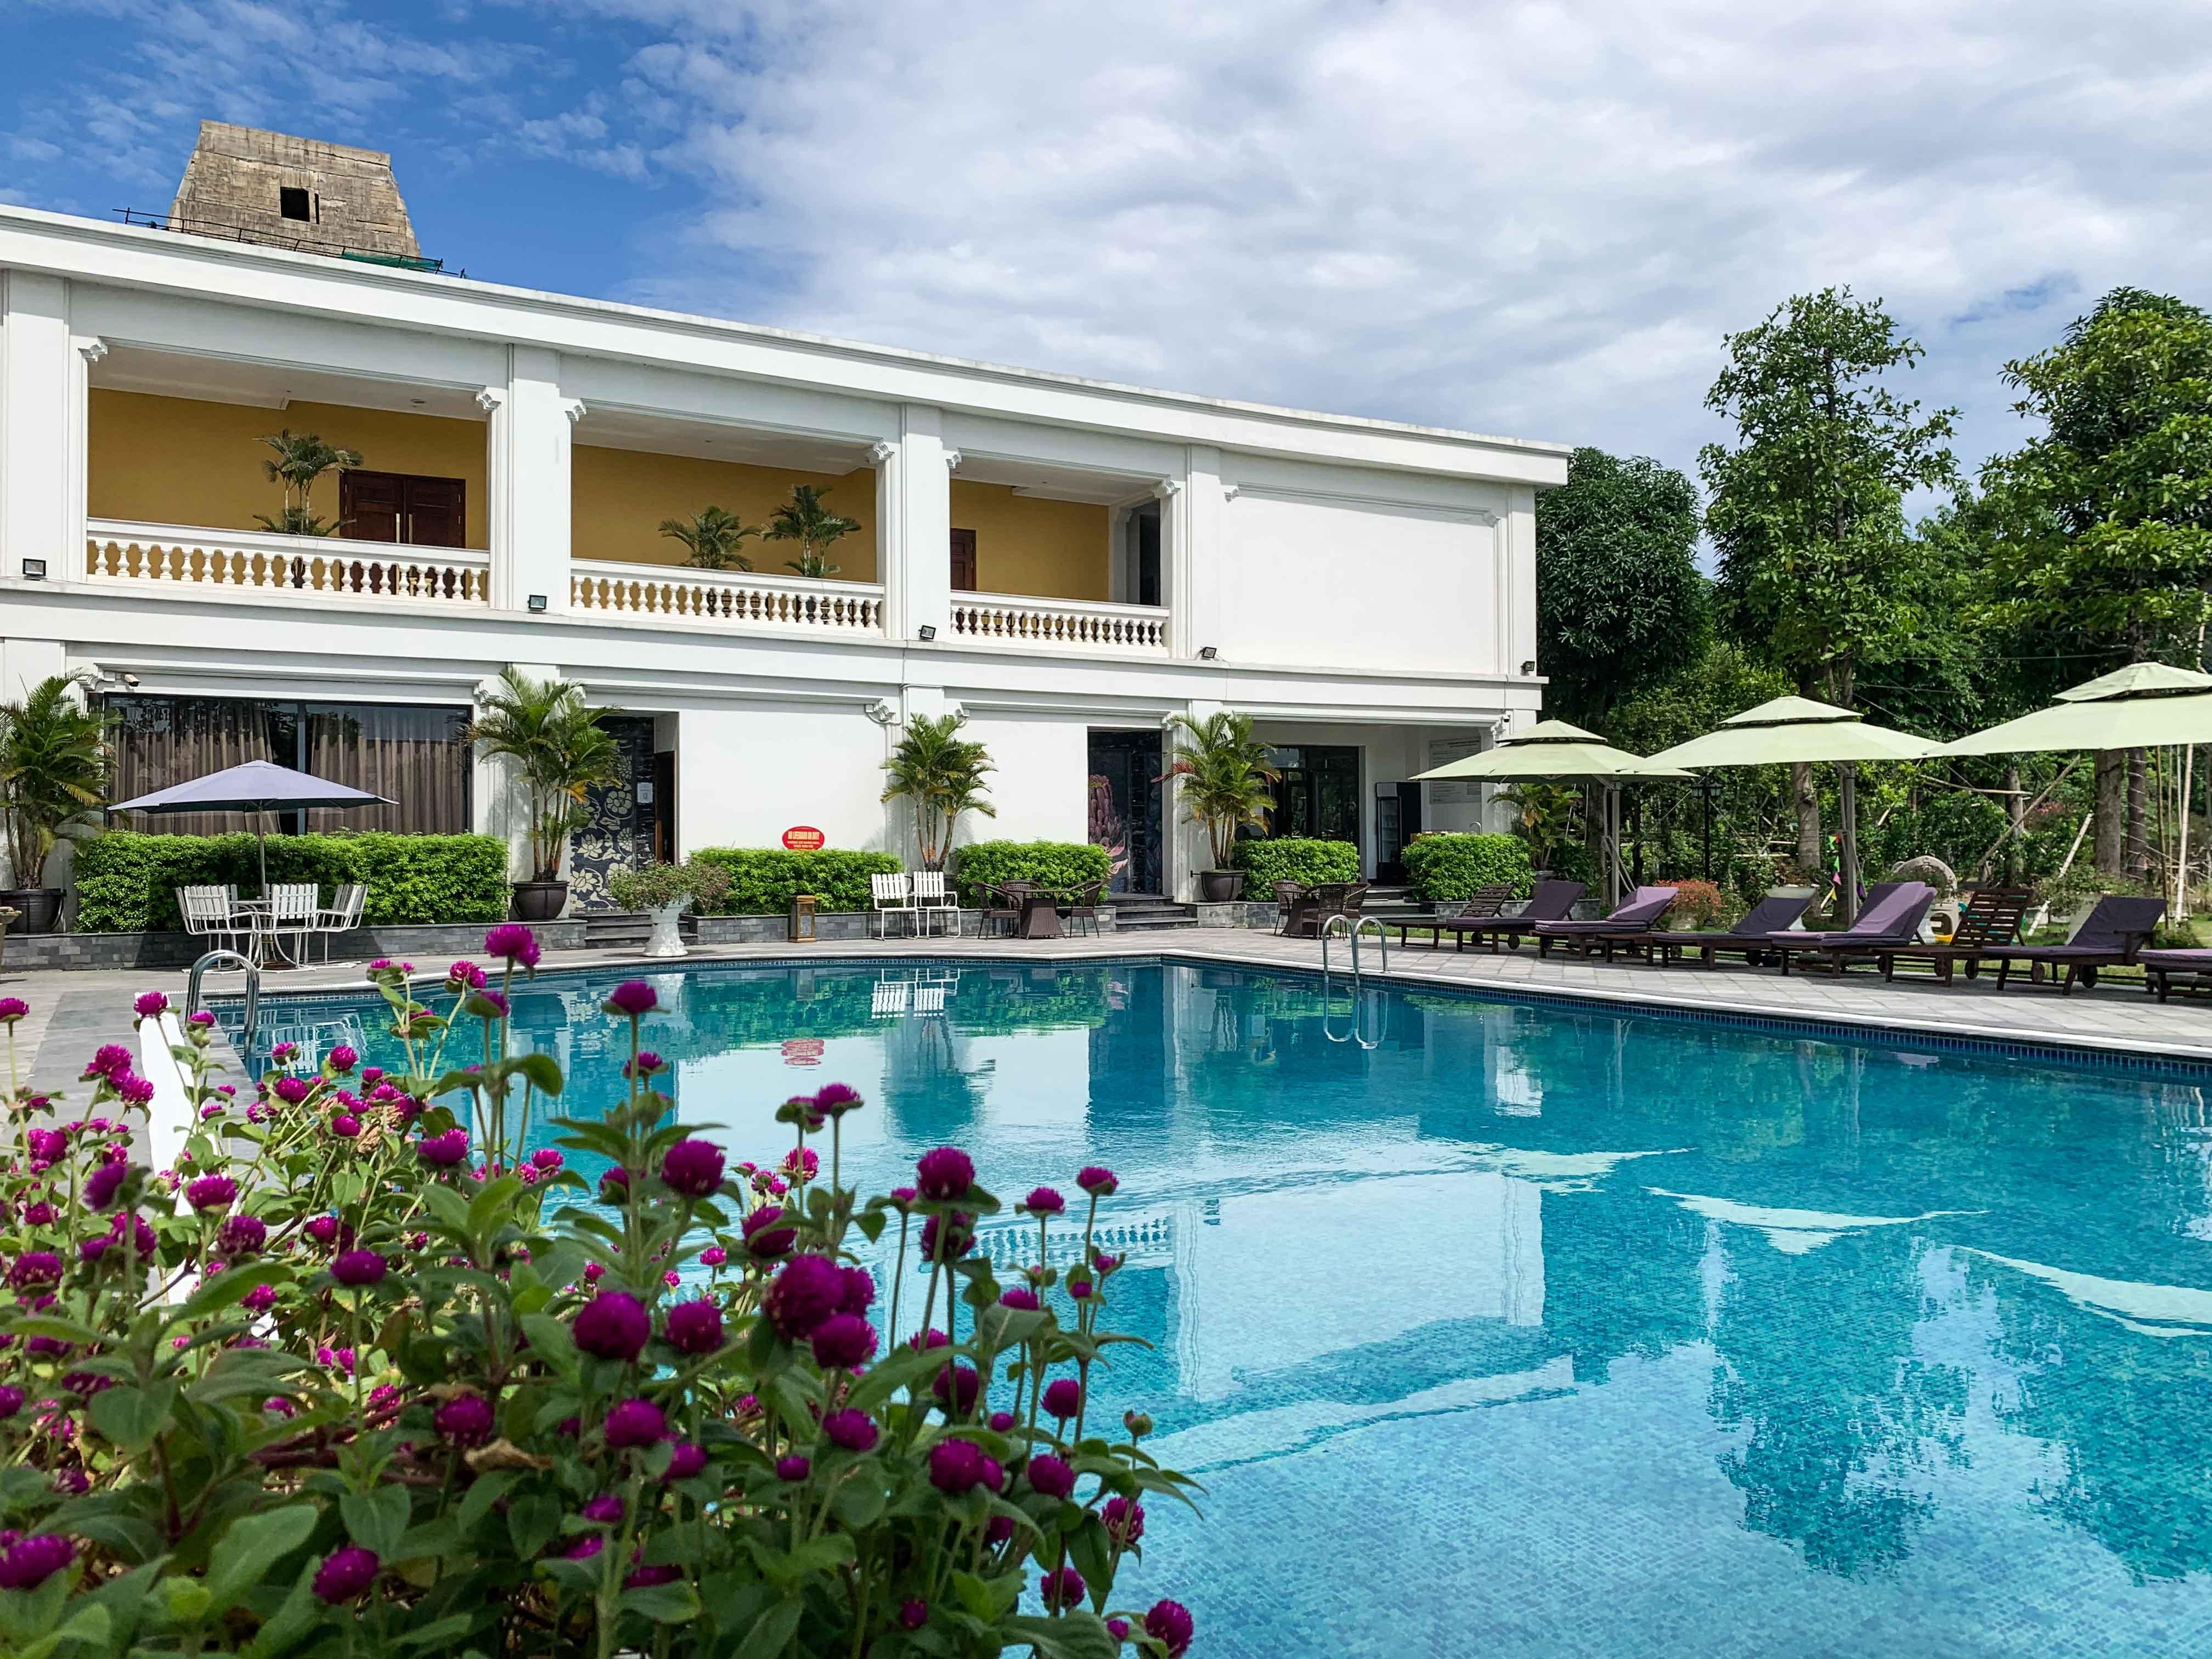 L'Hidden Charm Hotel & Resort, base ideale per un'avventura a Ninh Binh